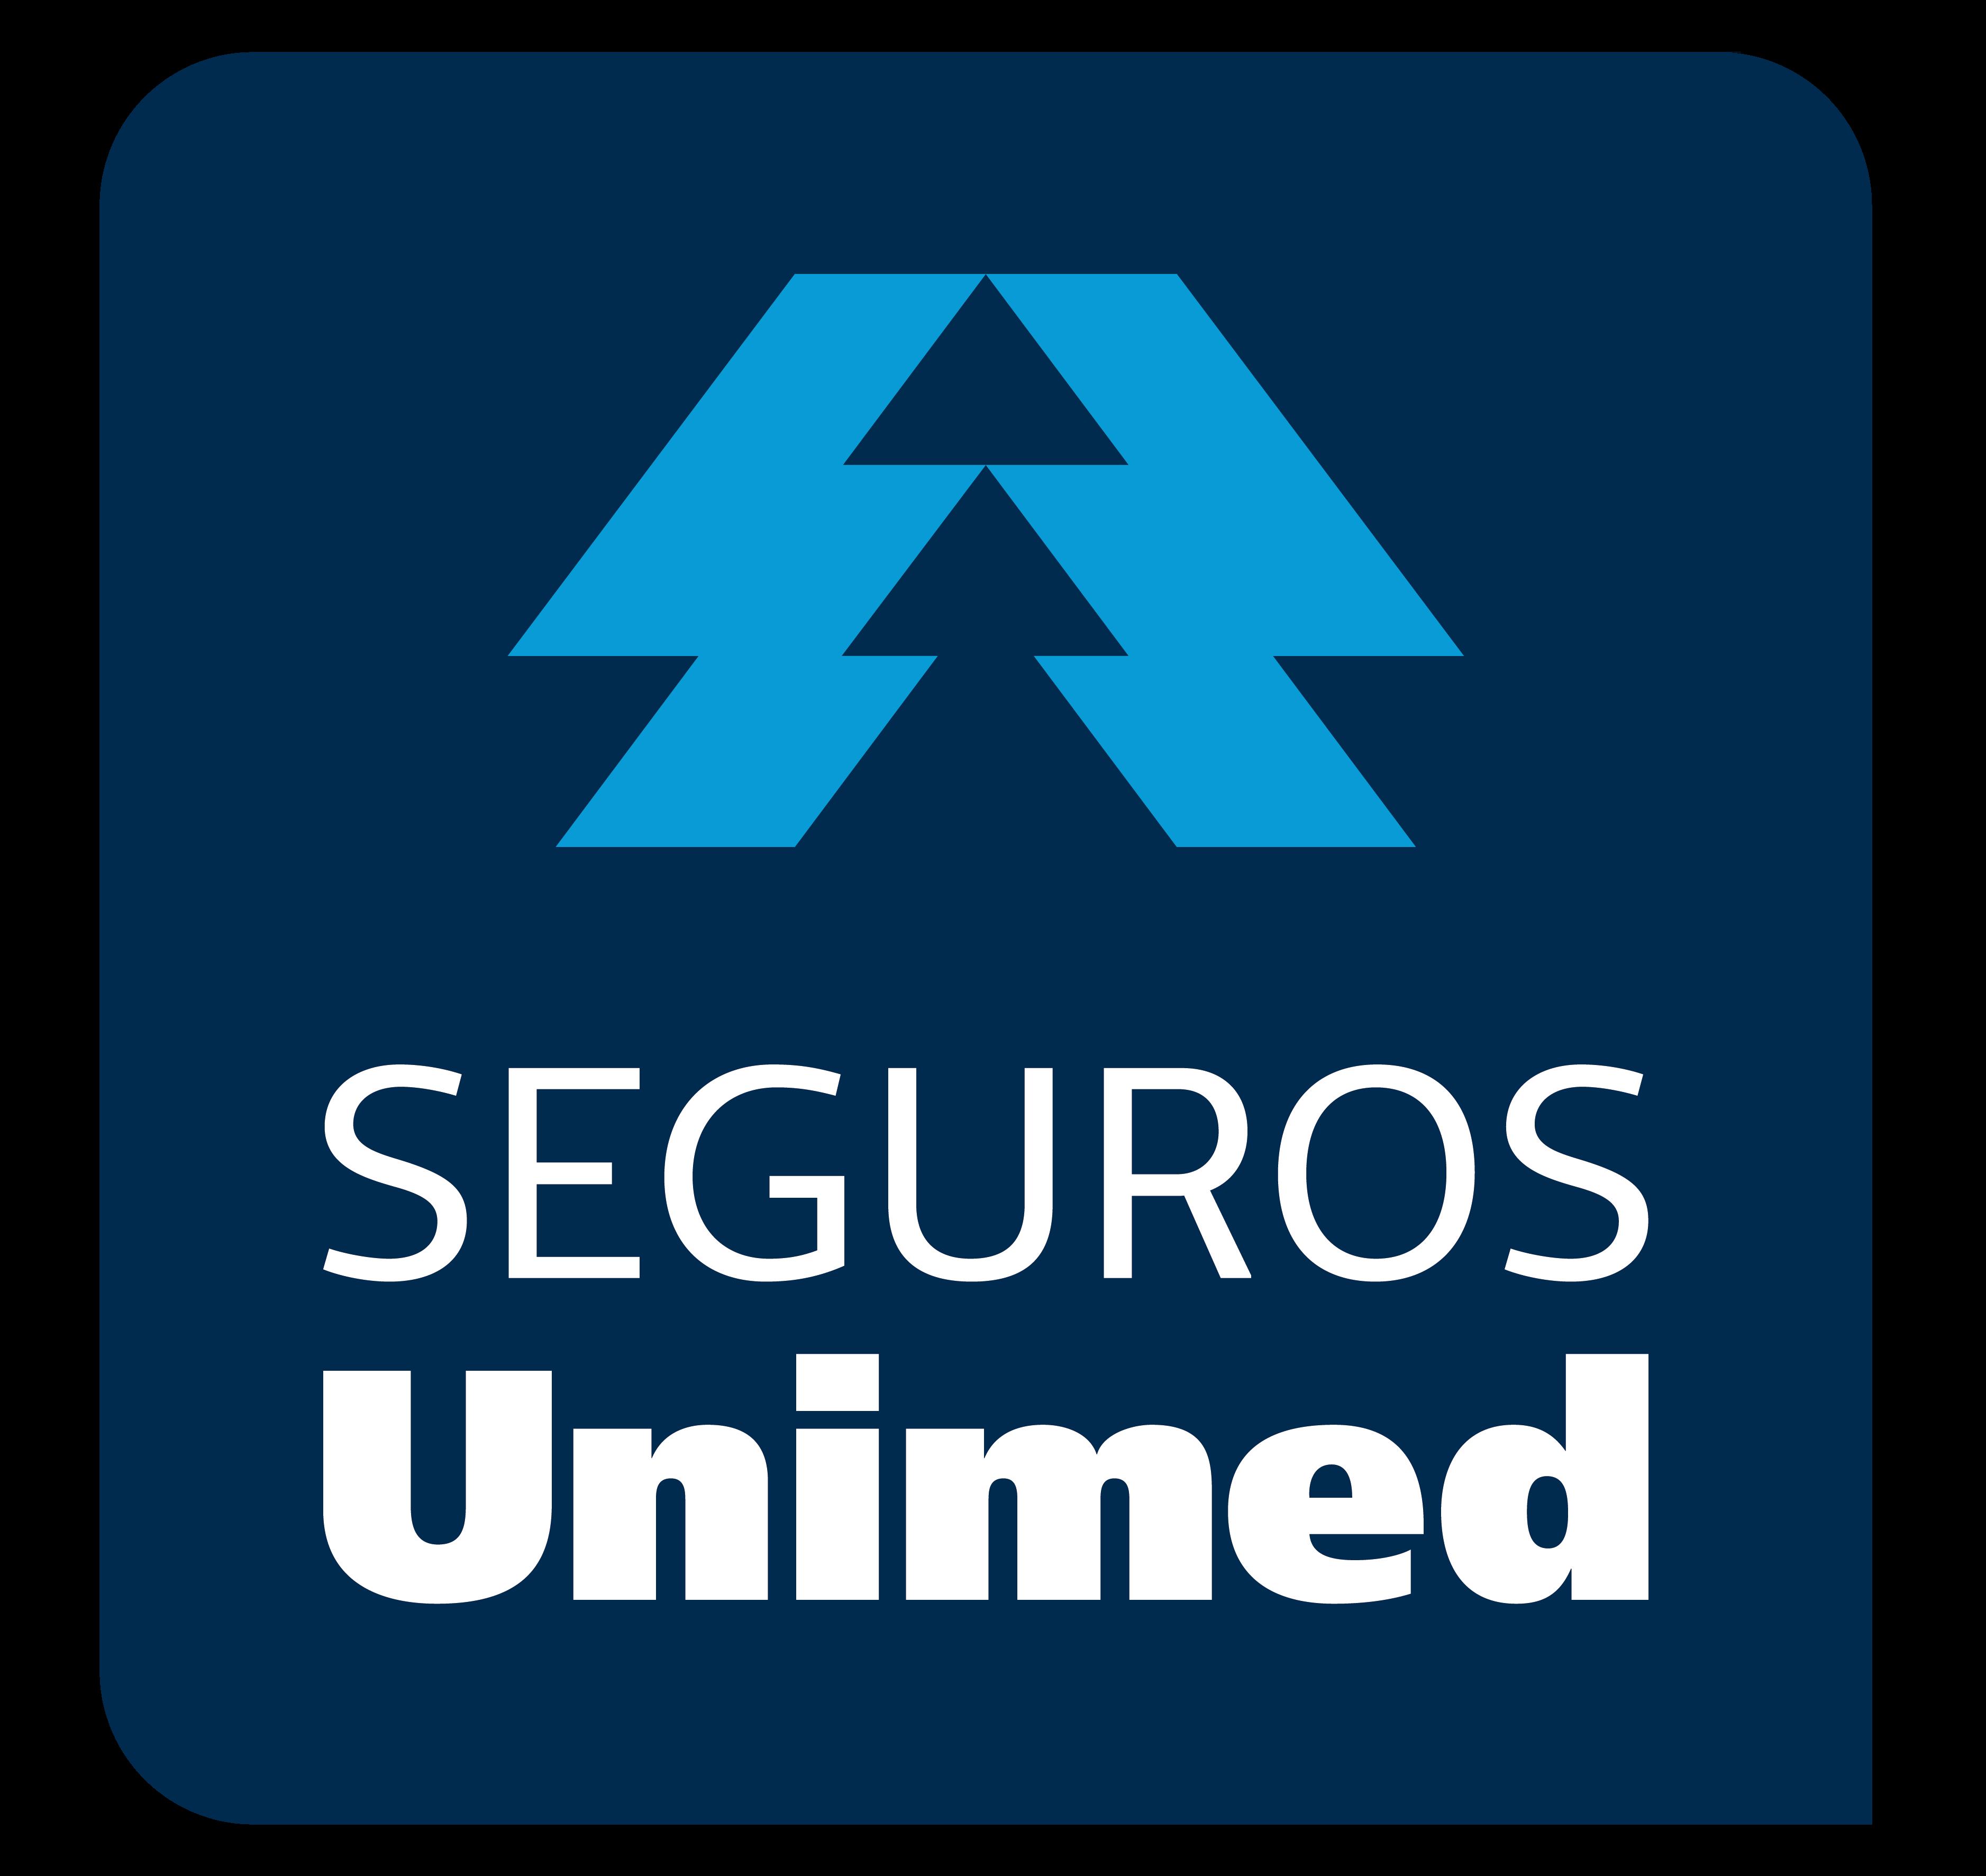 seguros unimed 25 11 2019